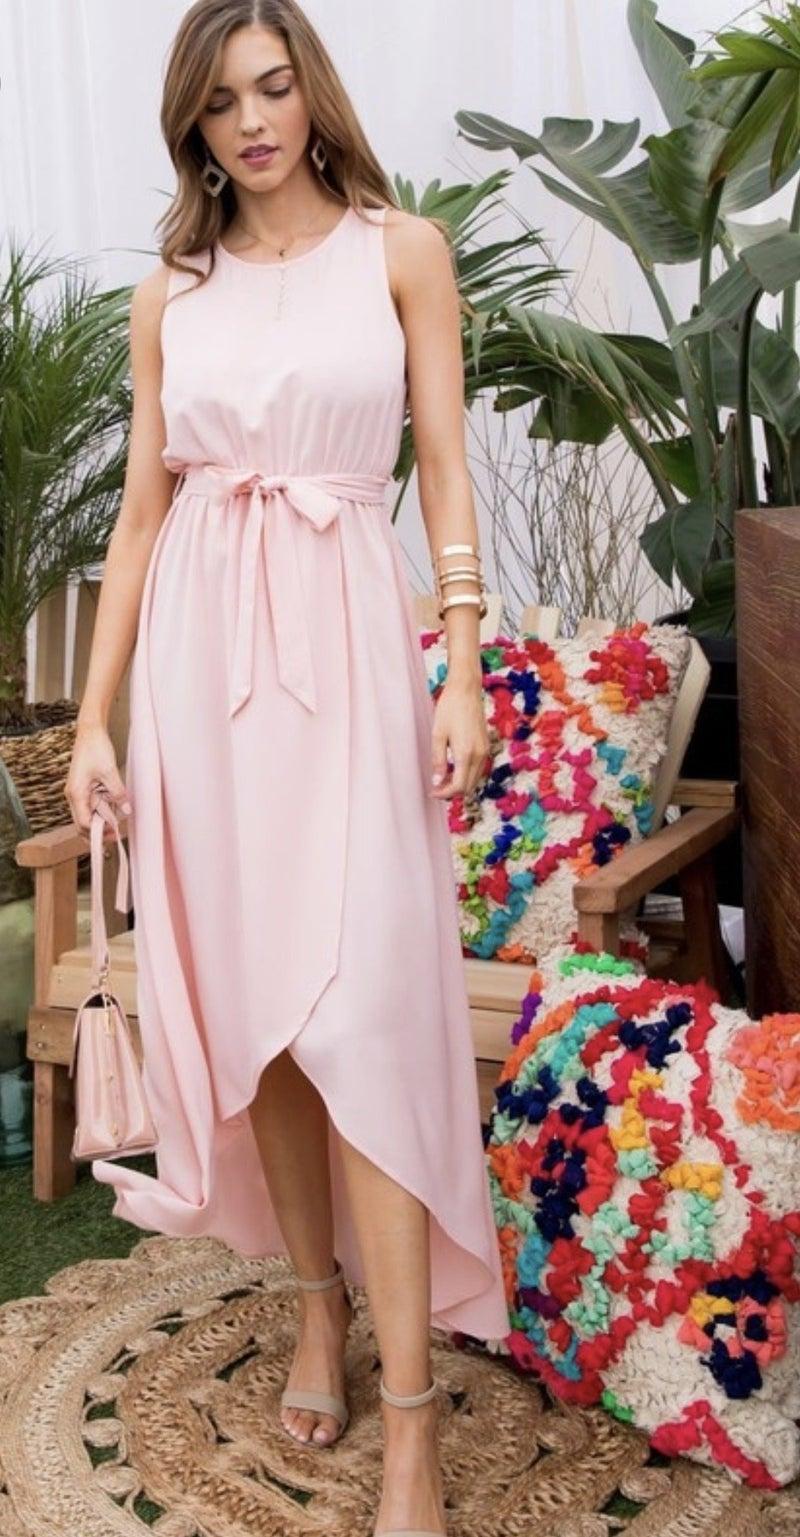 Round neck sleeveless dress